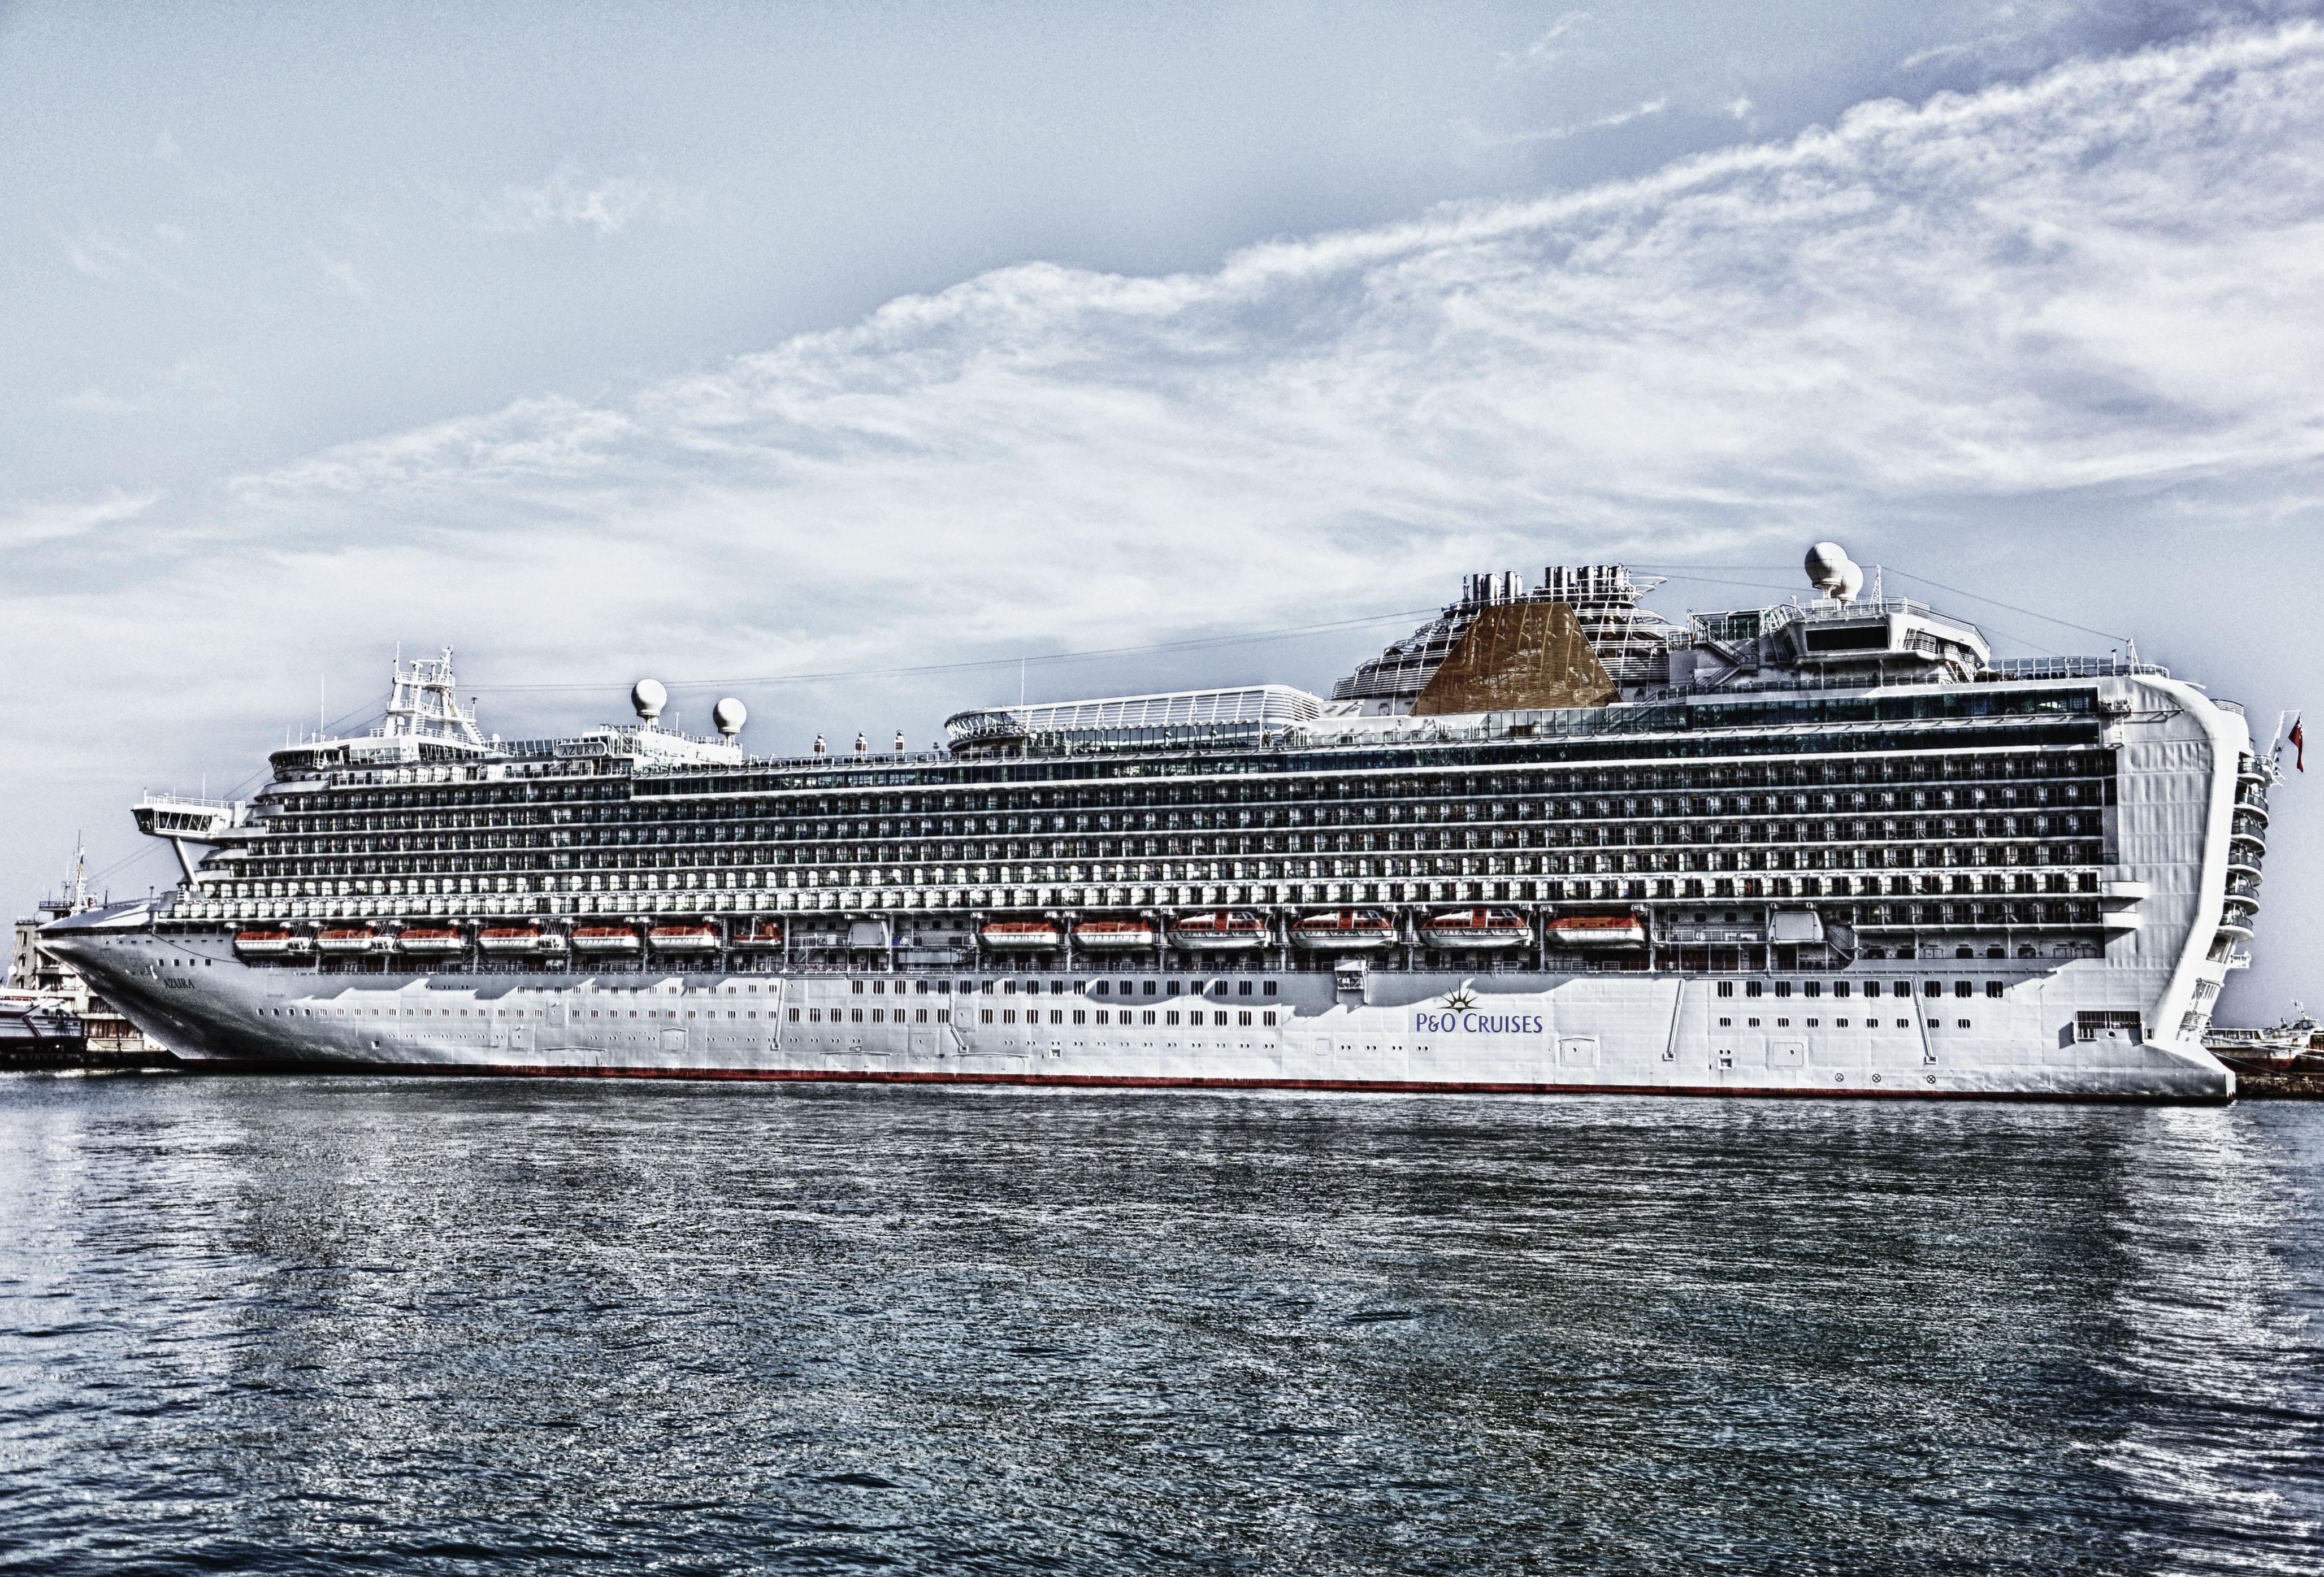 Cruise Ship 4k Ultra Hd Wallpaper Background Image 4112x2791